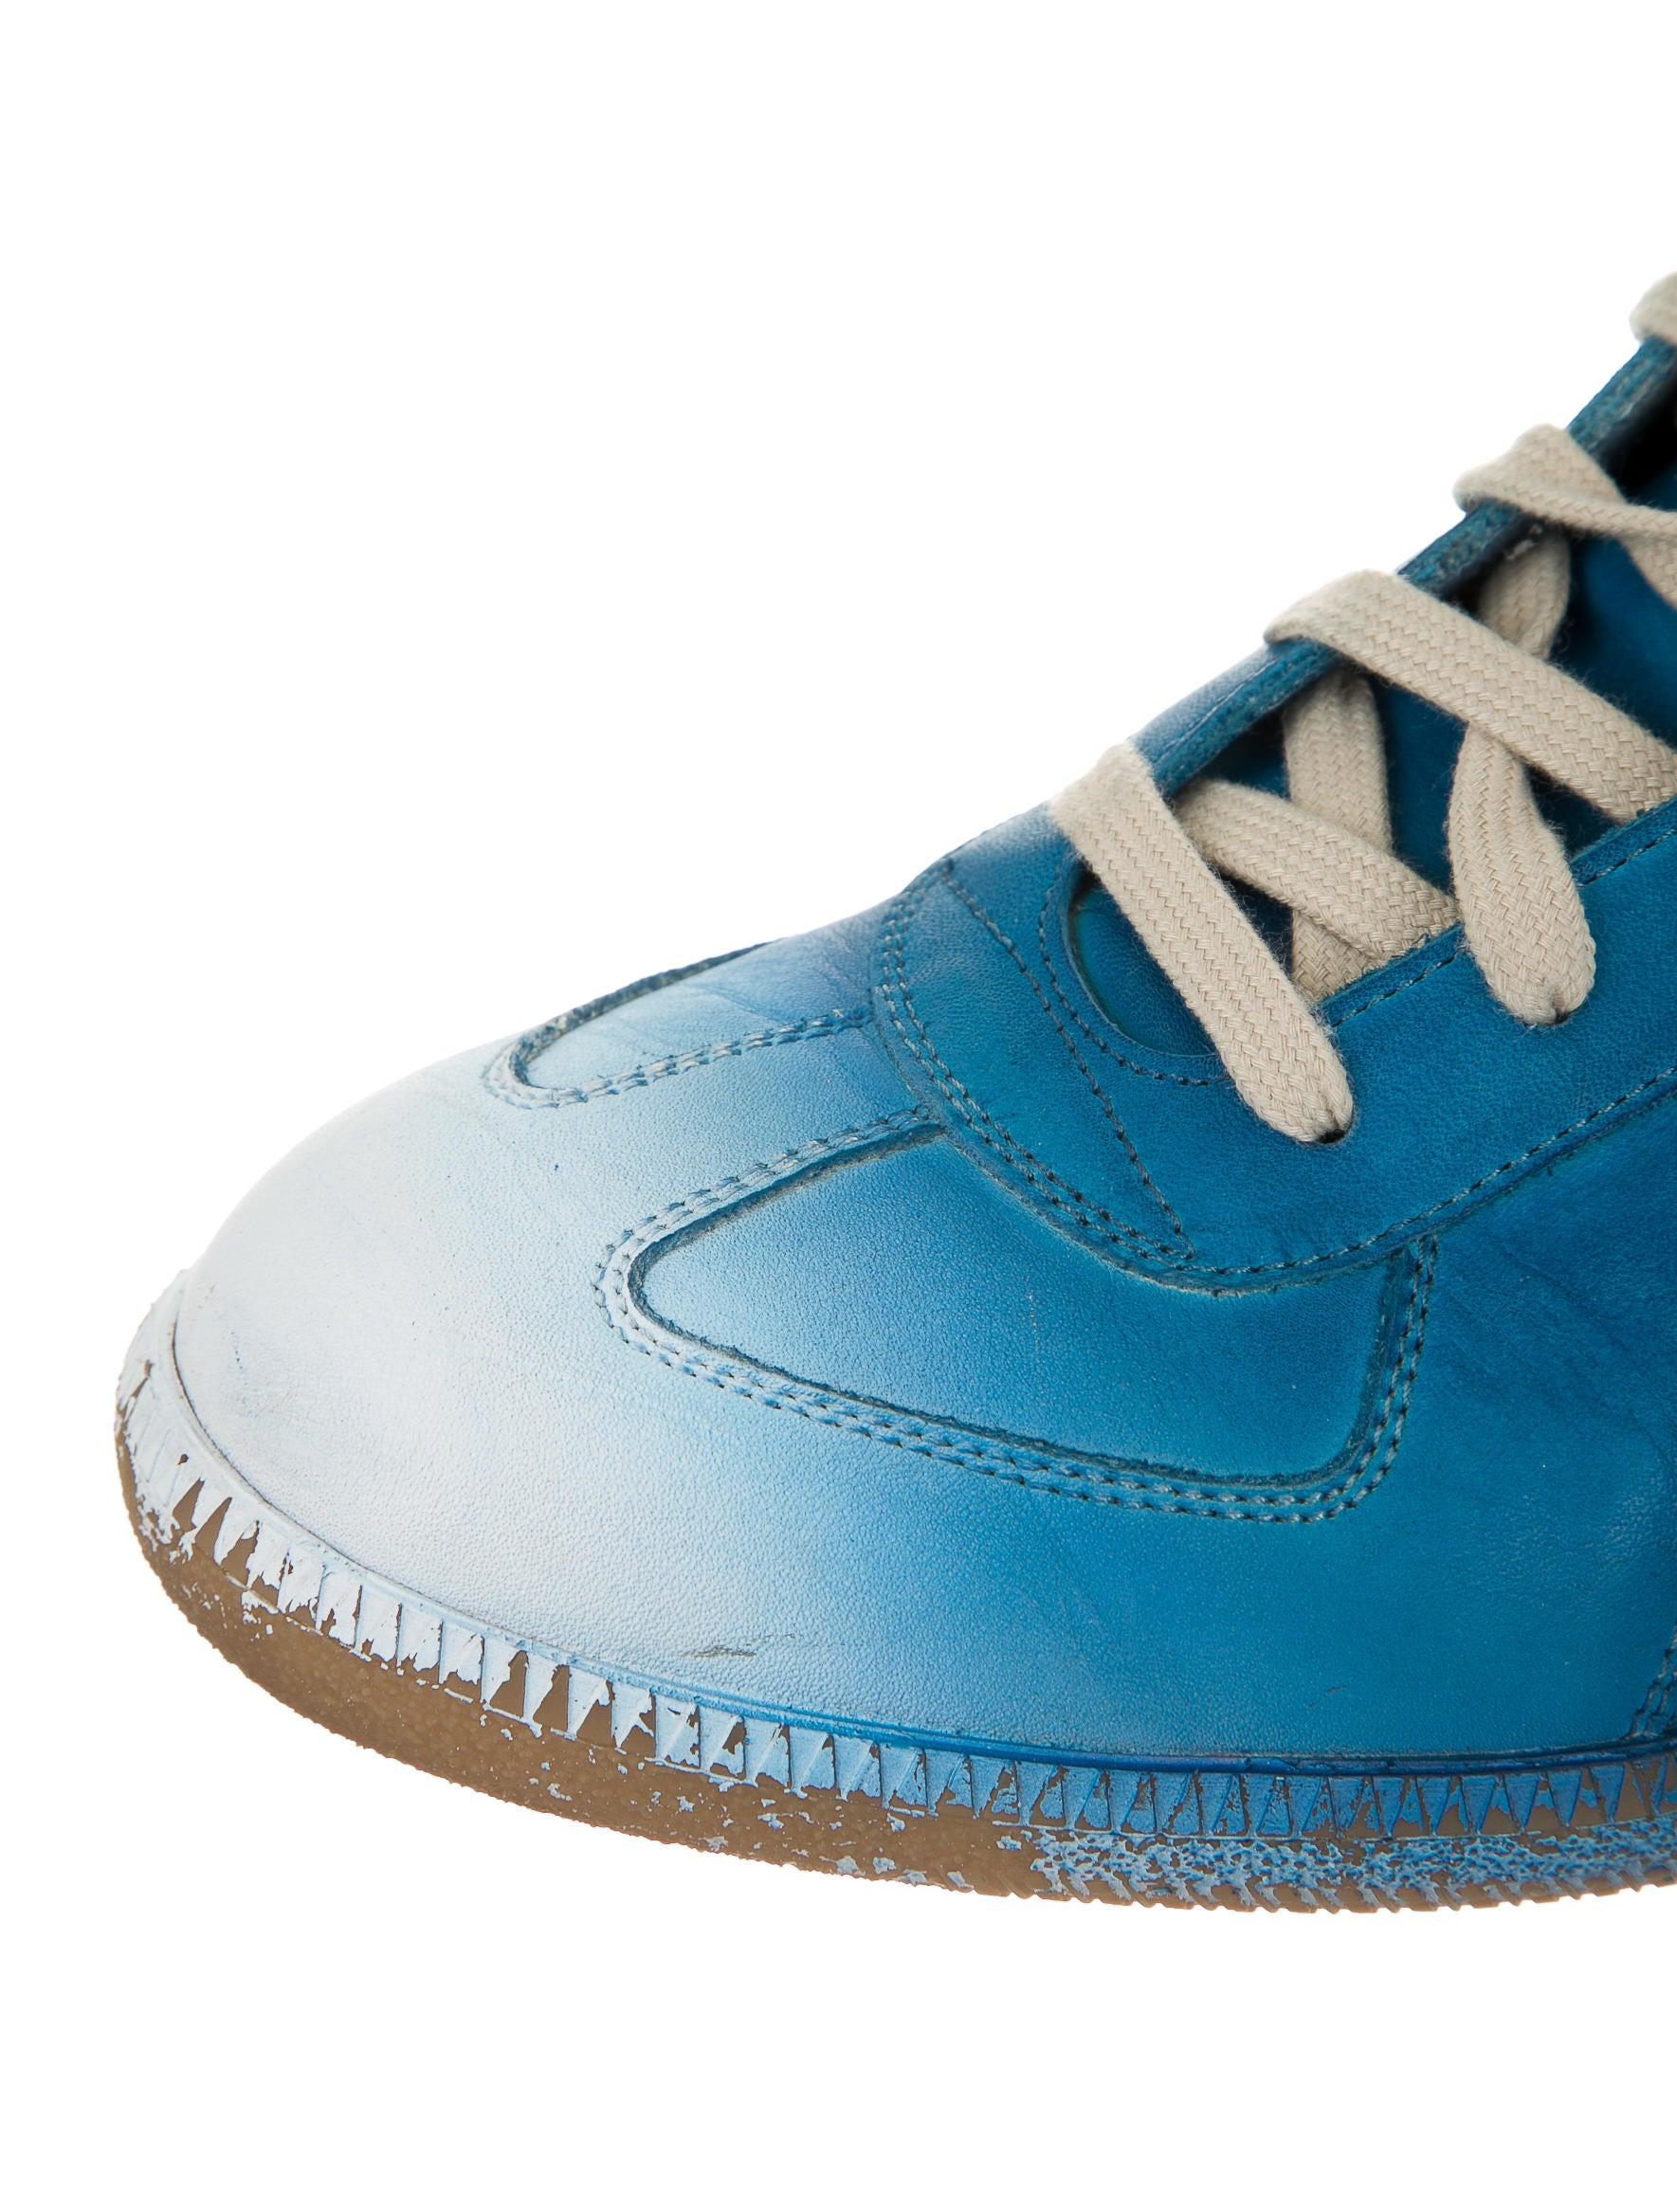 maison martin margiela sneakers shoes mai22261 the realreal. Black Bedroom Furniture Sets. Home Design Ideas